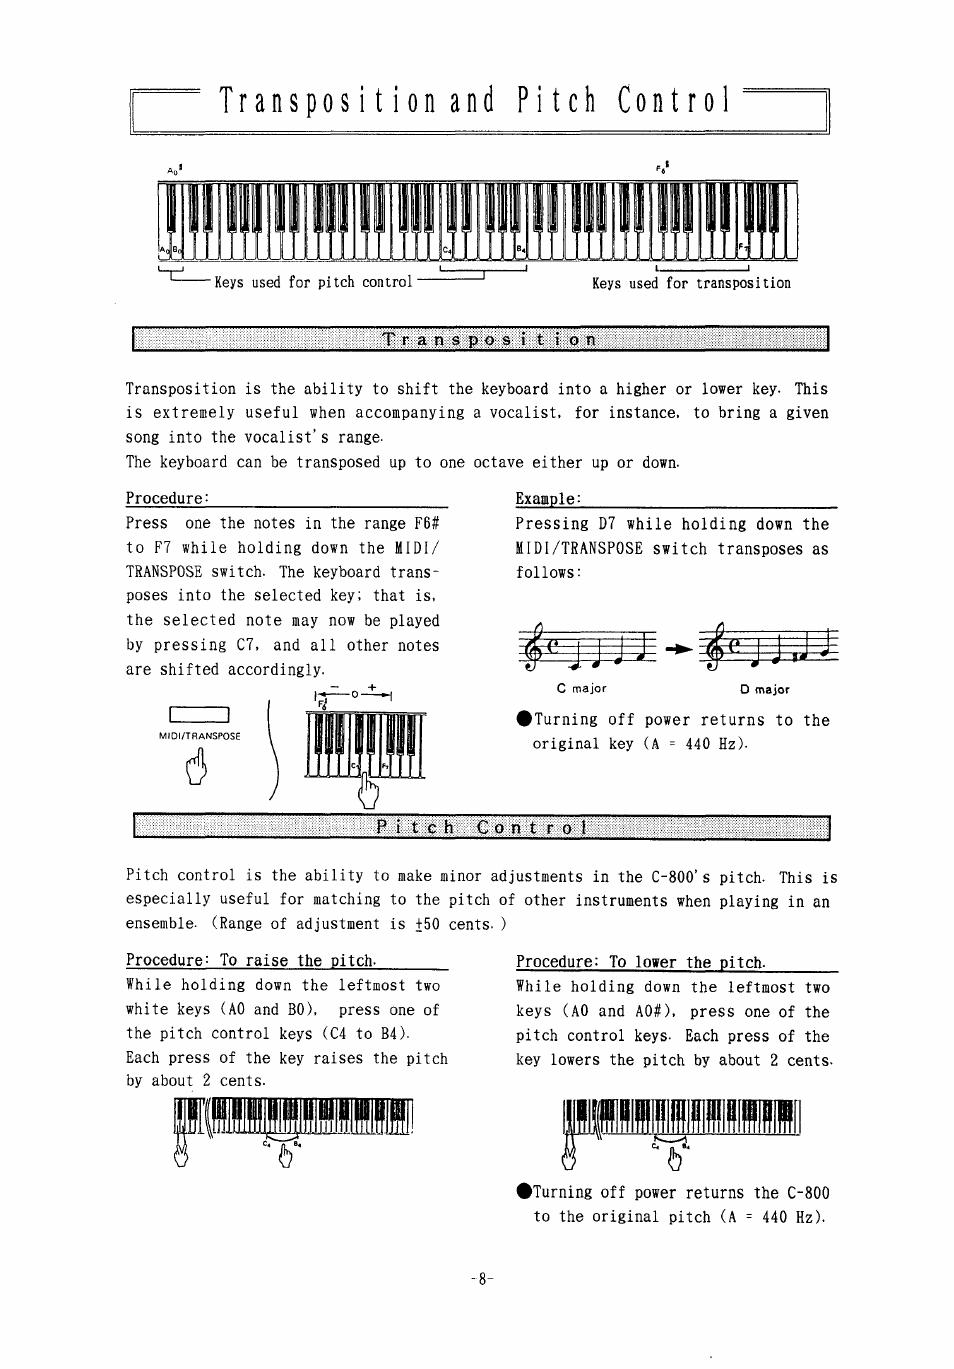 Transposition and pitch control, Pliillliil   KORG Concert